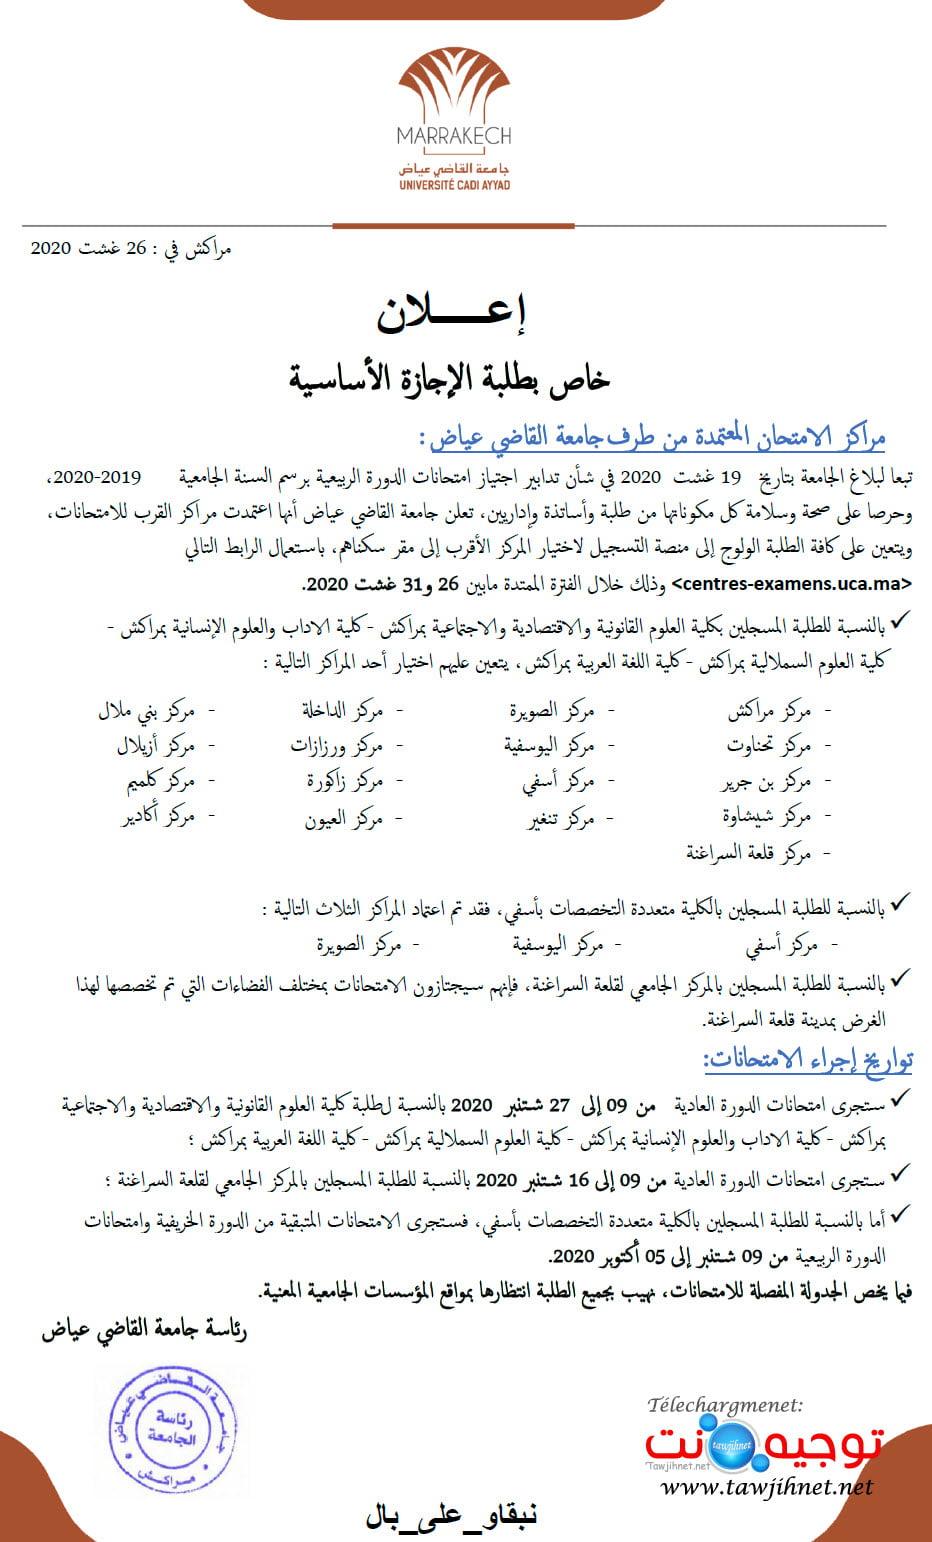 universite-marrakech-2020.jpg